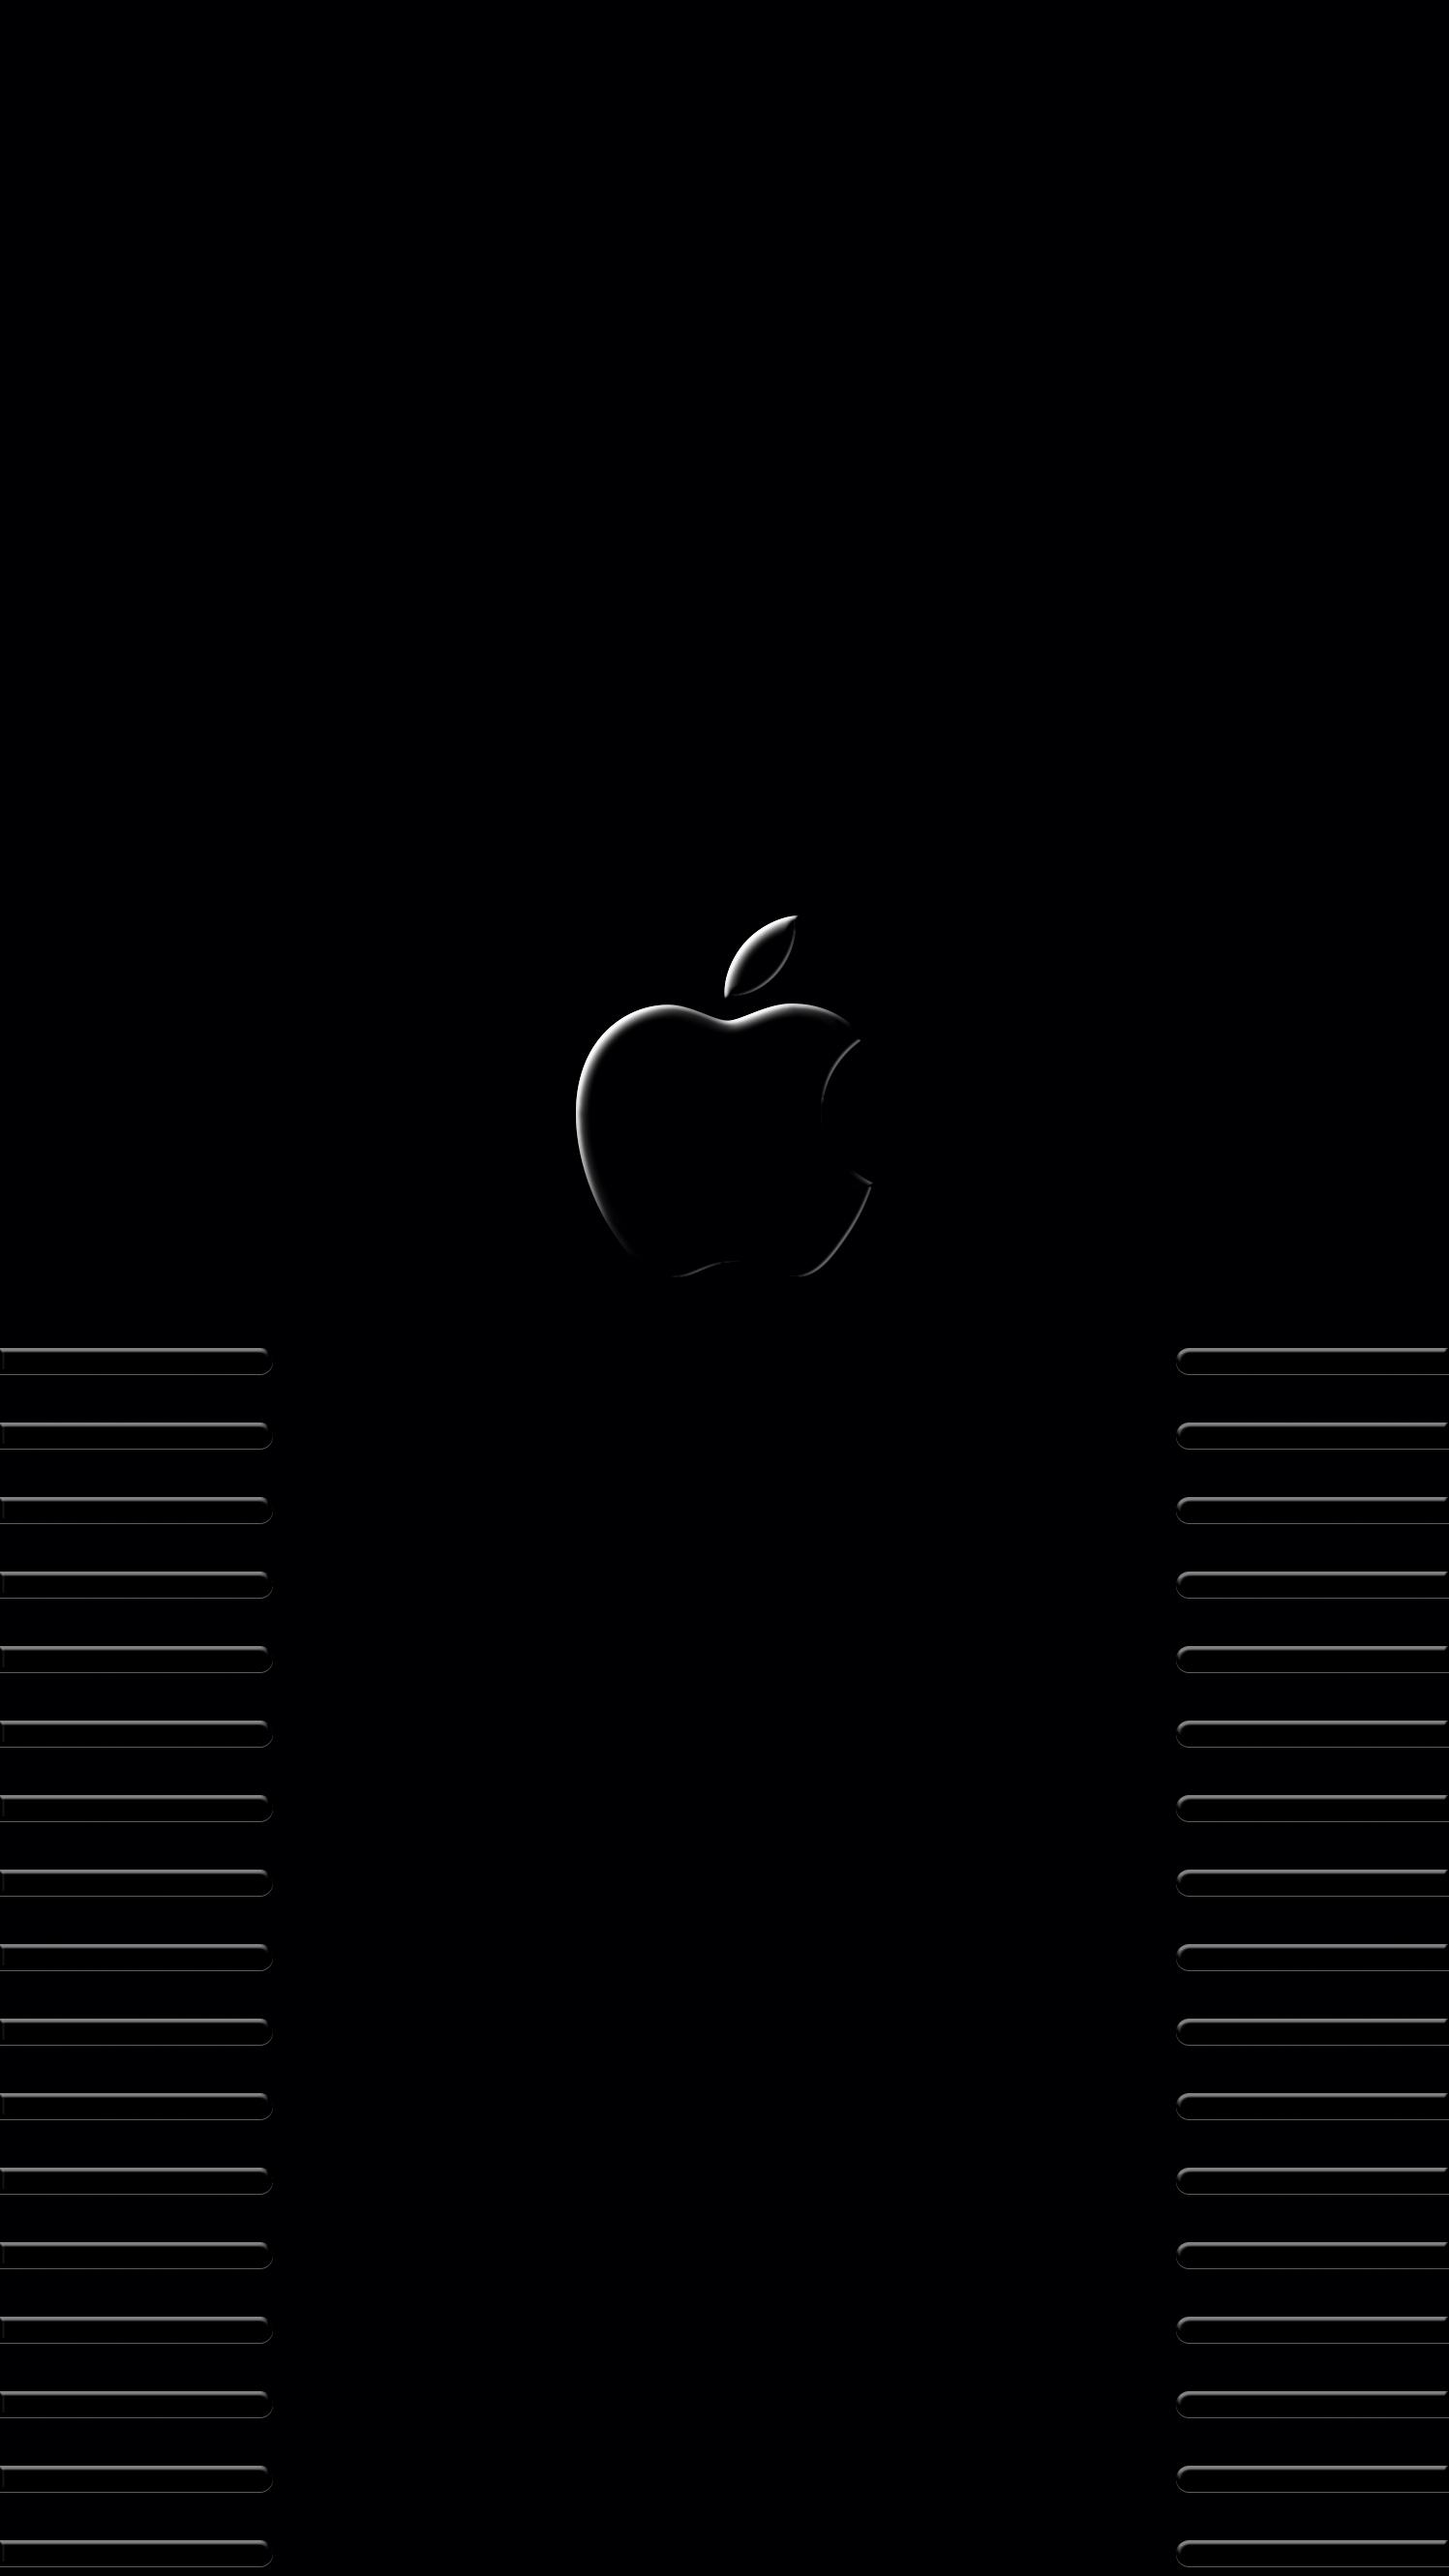 Black Apple Iphone Wallpapers Top Free Black Apple Iphone